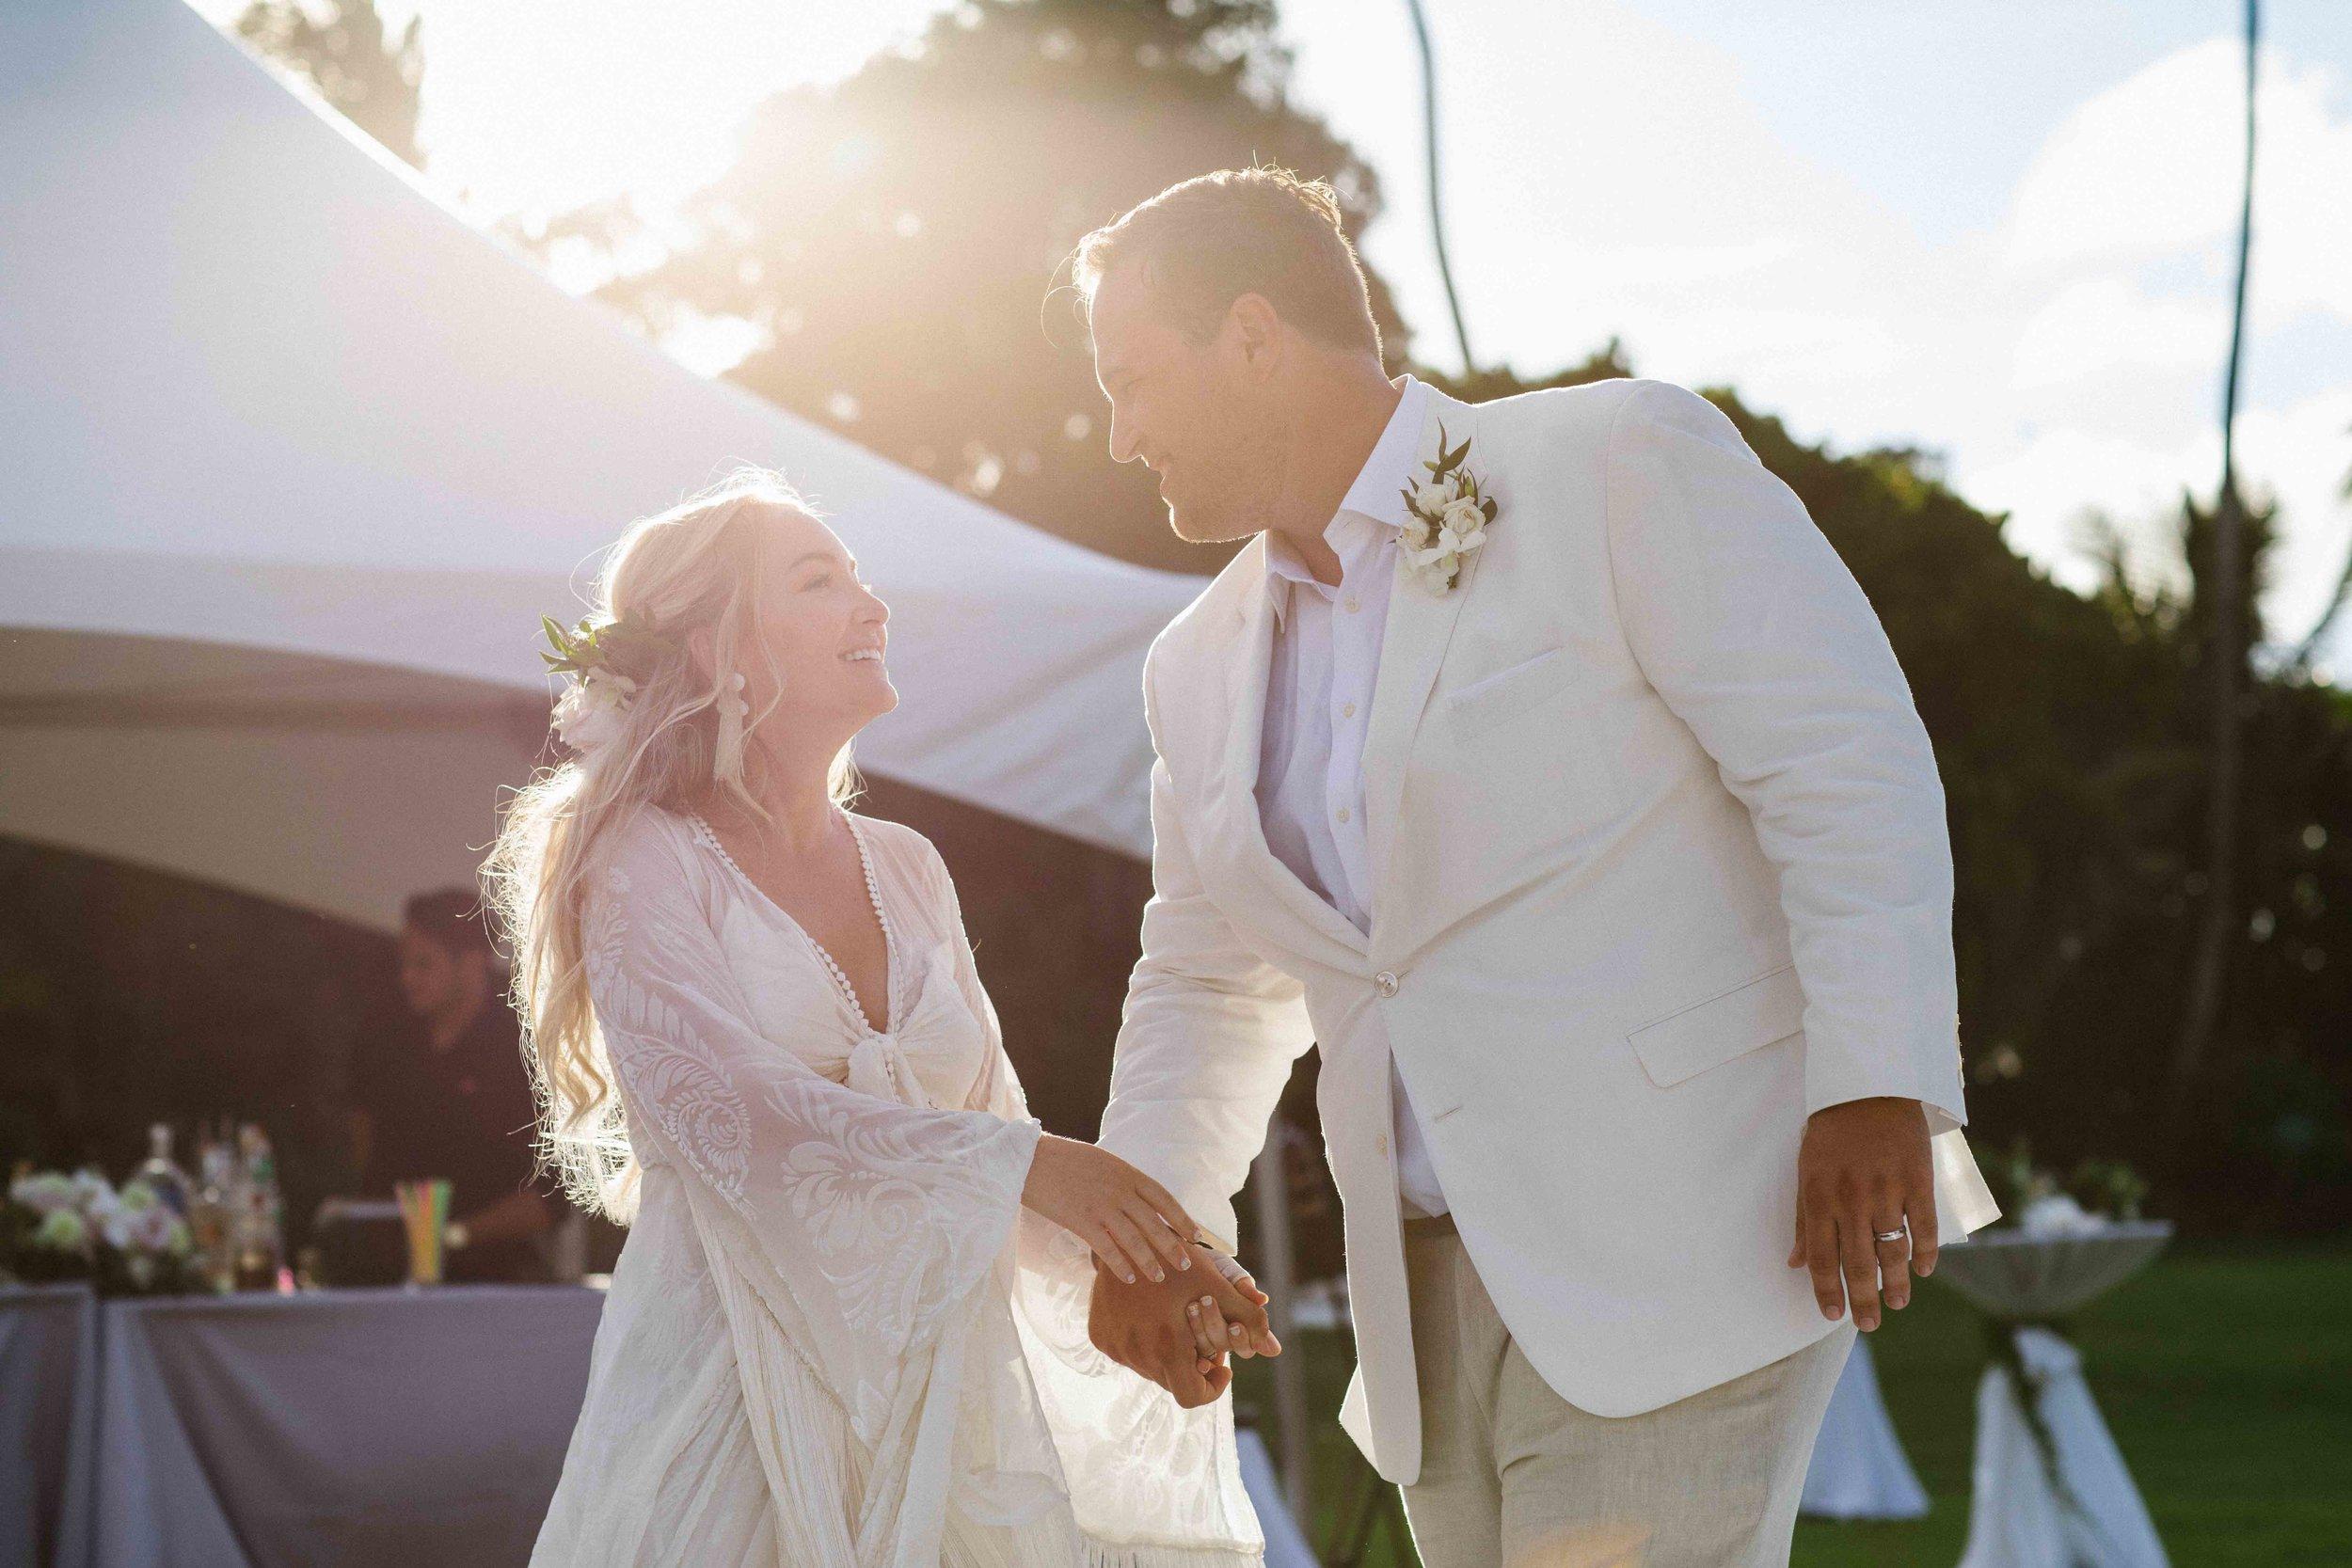 Backlit Wedding Photography of Bride and Groom